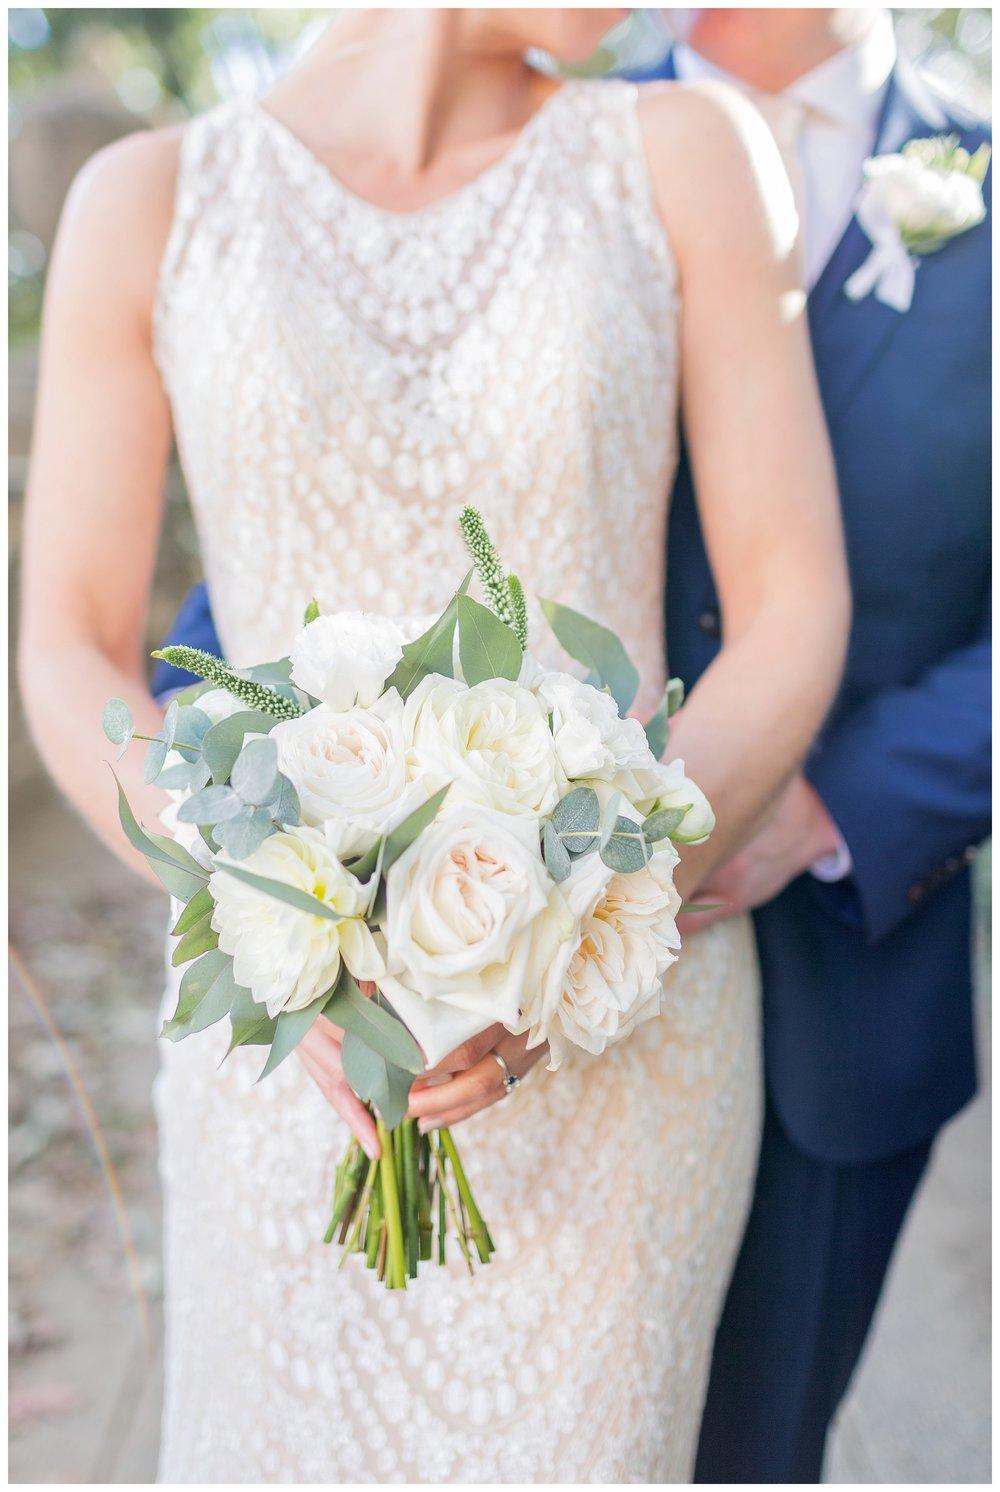 Meridian Hill Park Wedding | Washington DC Wedding Photographer Kir Tuben_0031.jpg